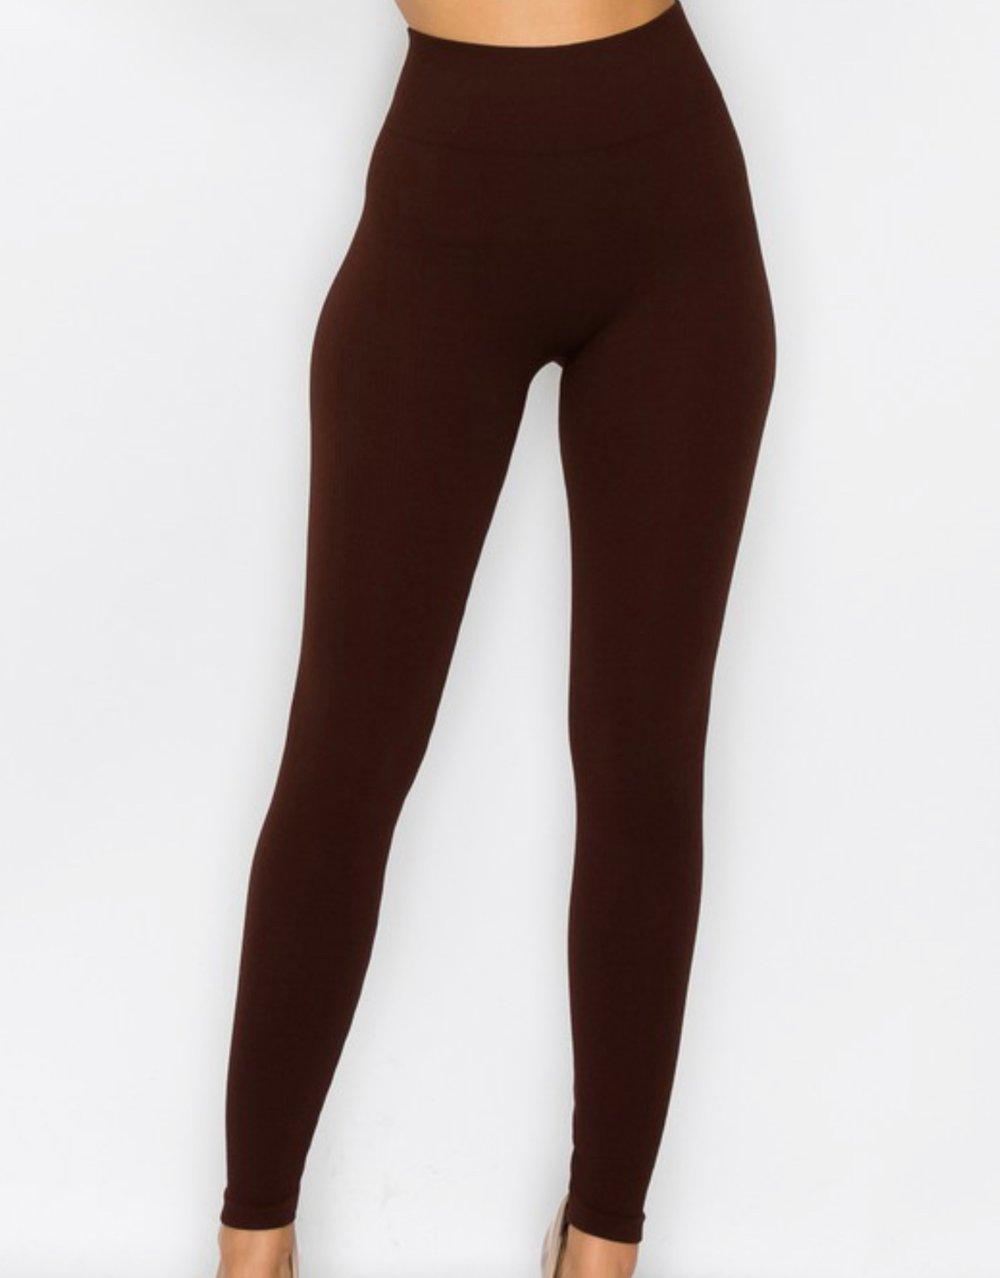 Image of Chocolate Bodysuit | Pants Set